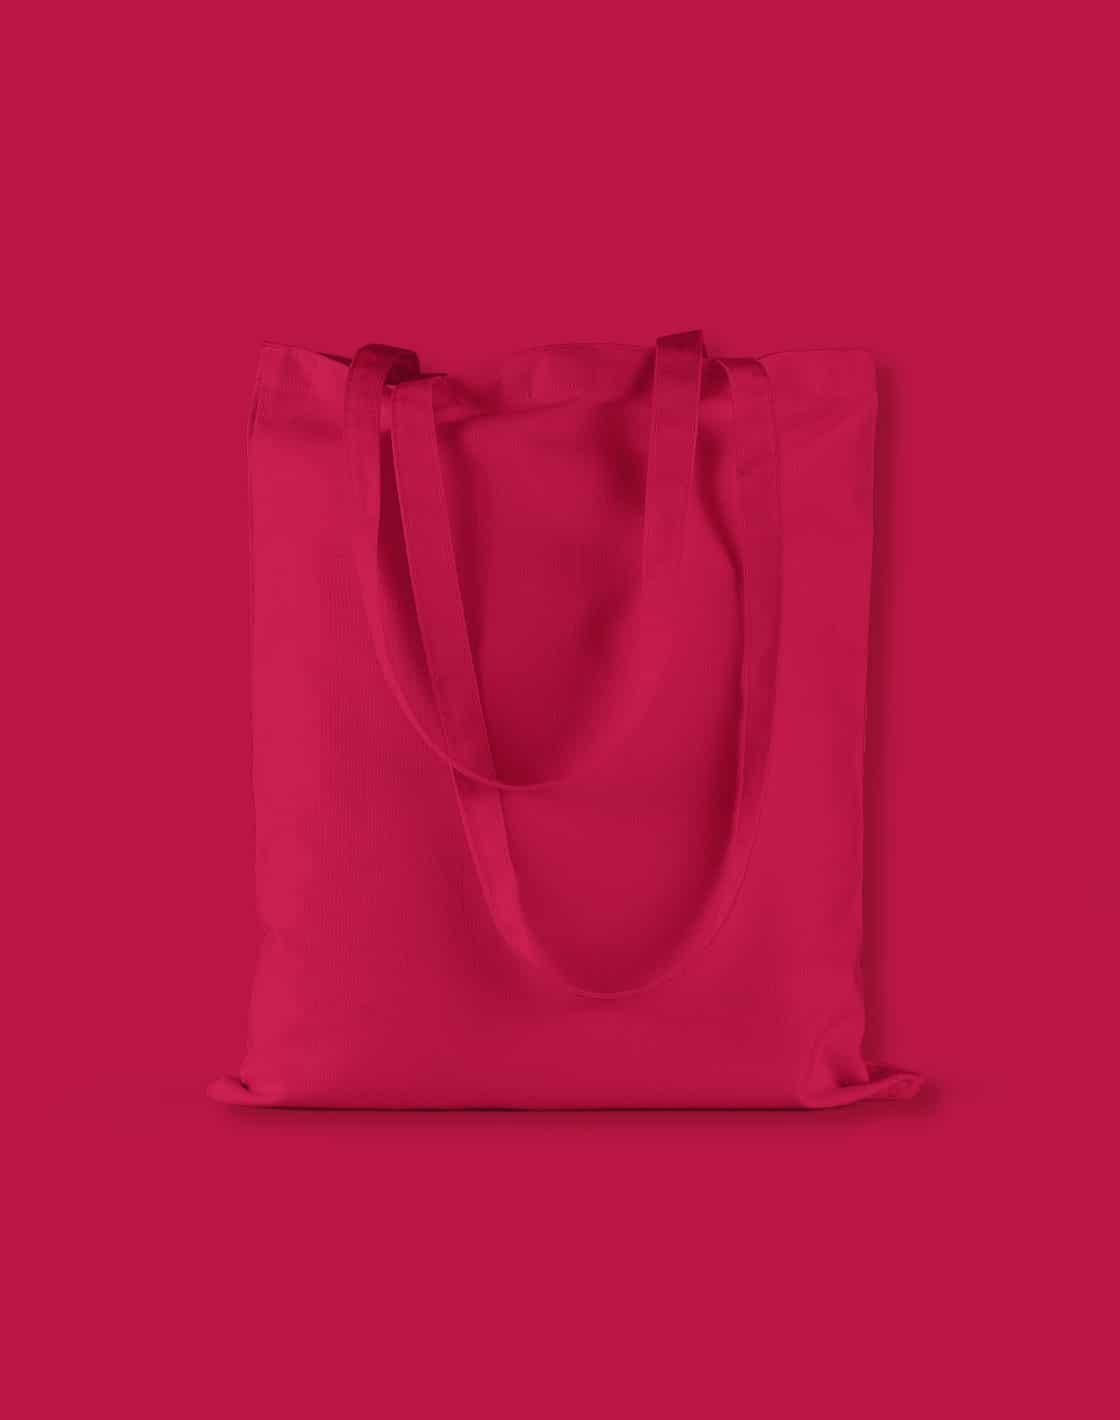 baumwolltaschen bunt classic red lange henkel 38x42cm